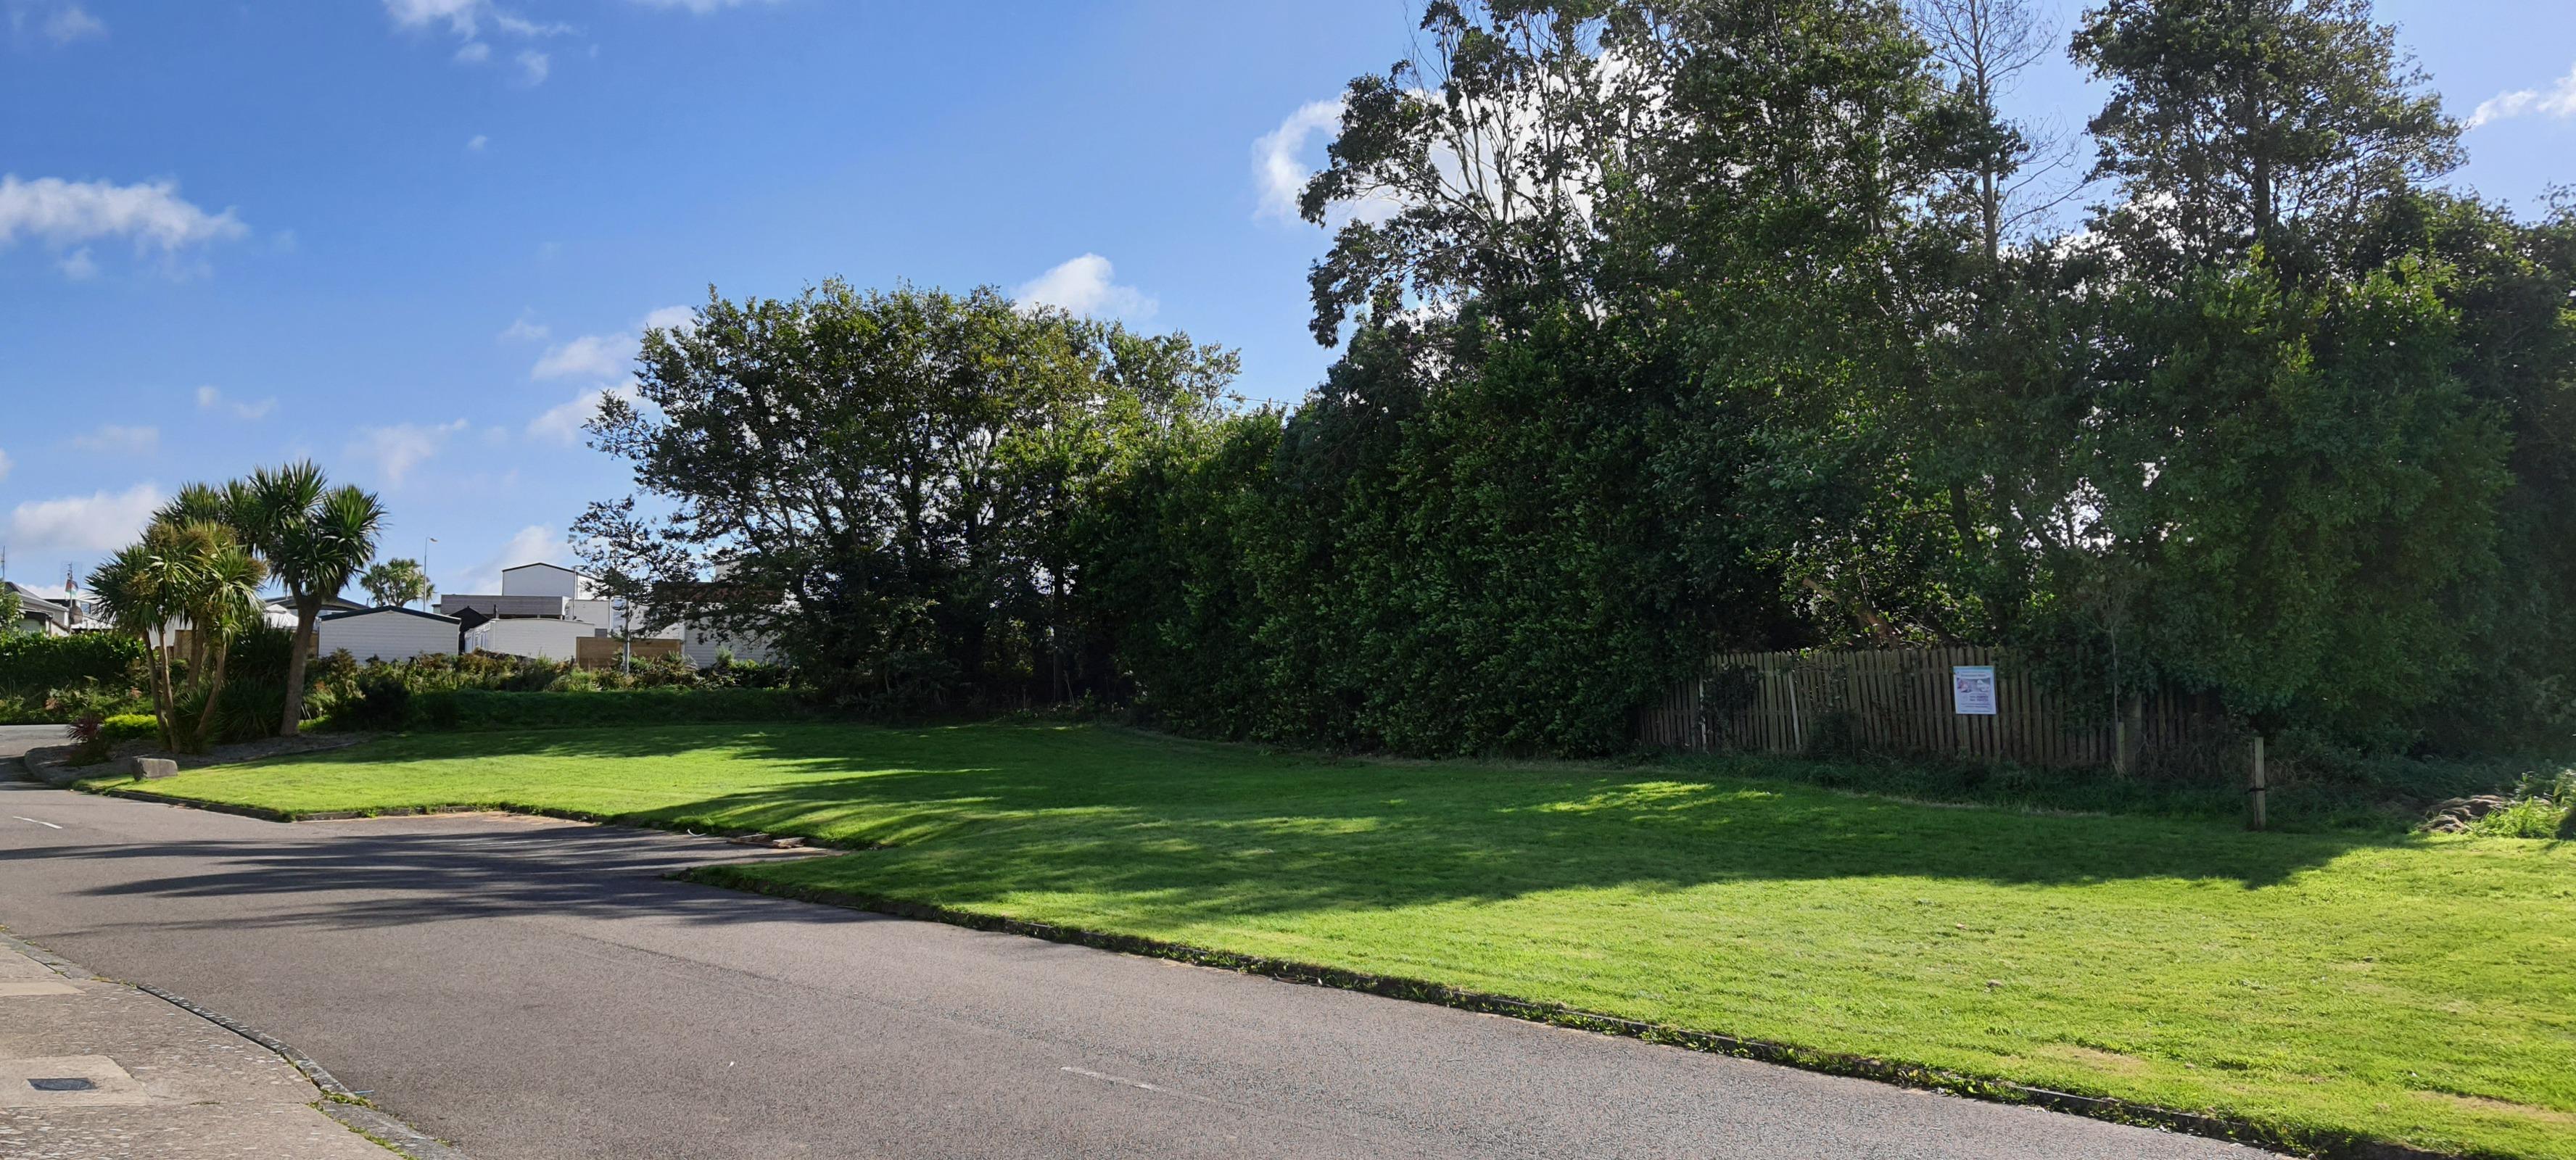 7 Branogue Park, Gorey, Co. Wexford